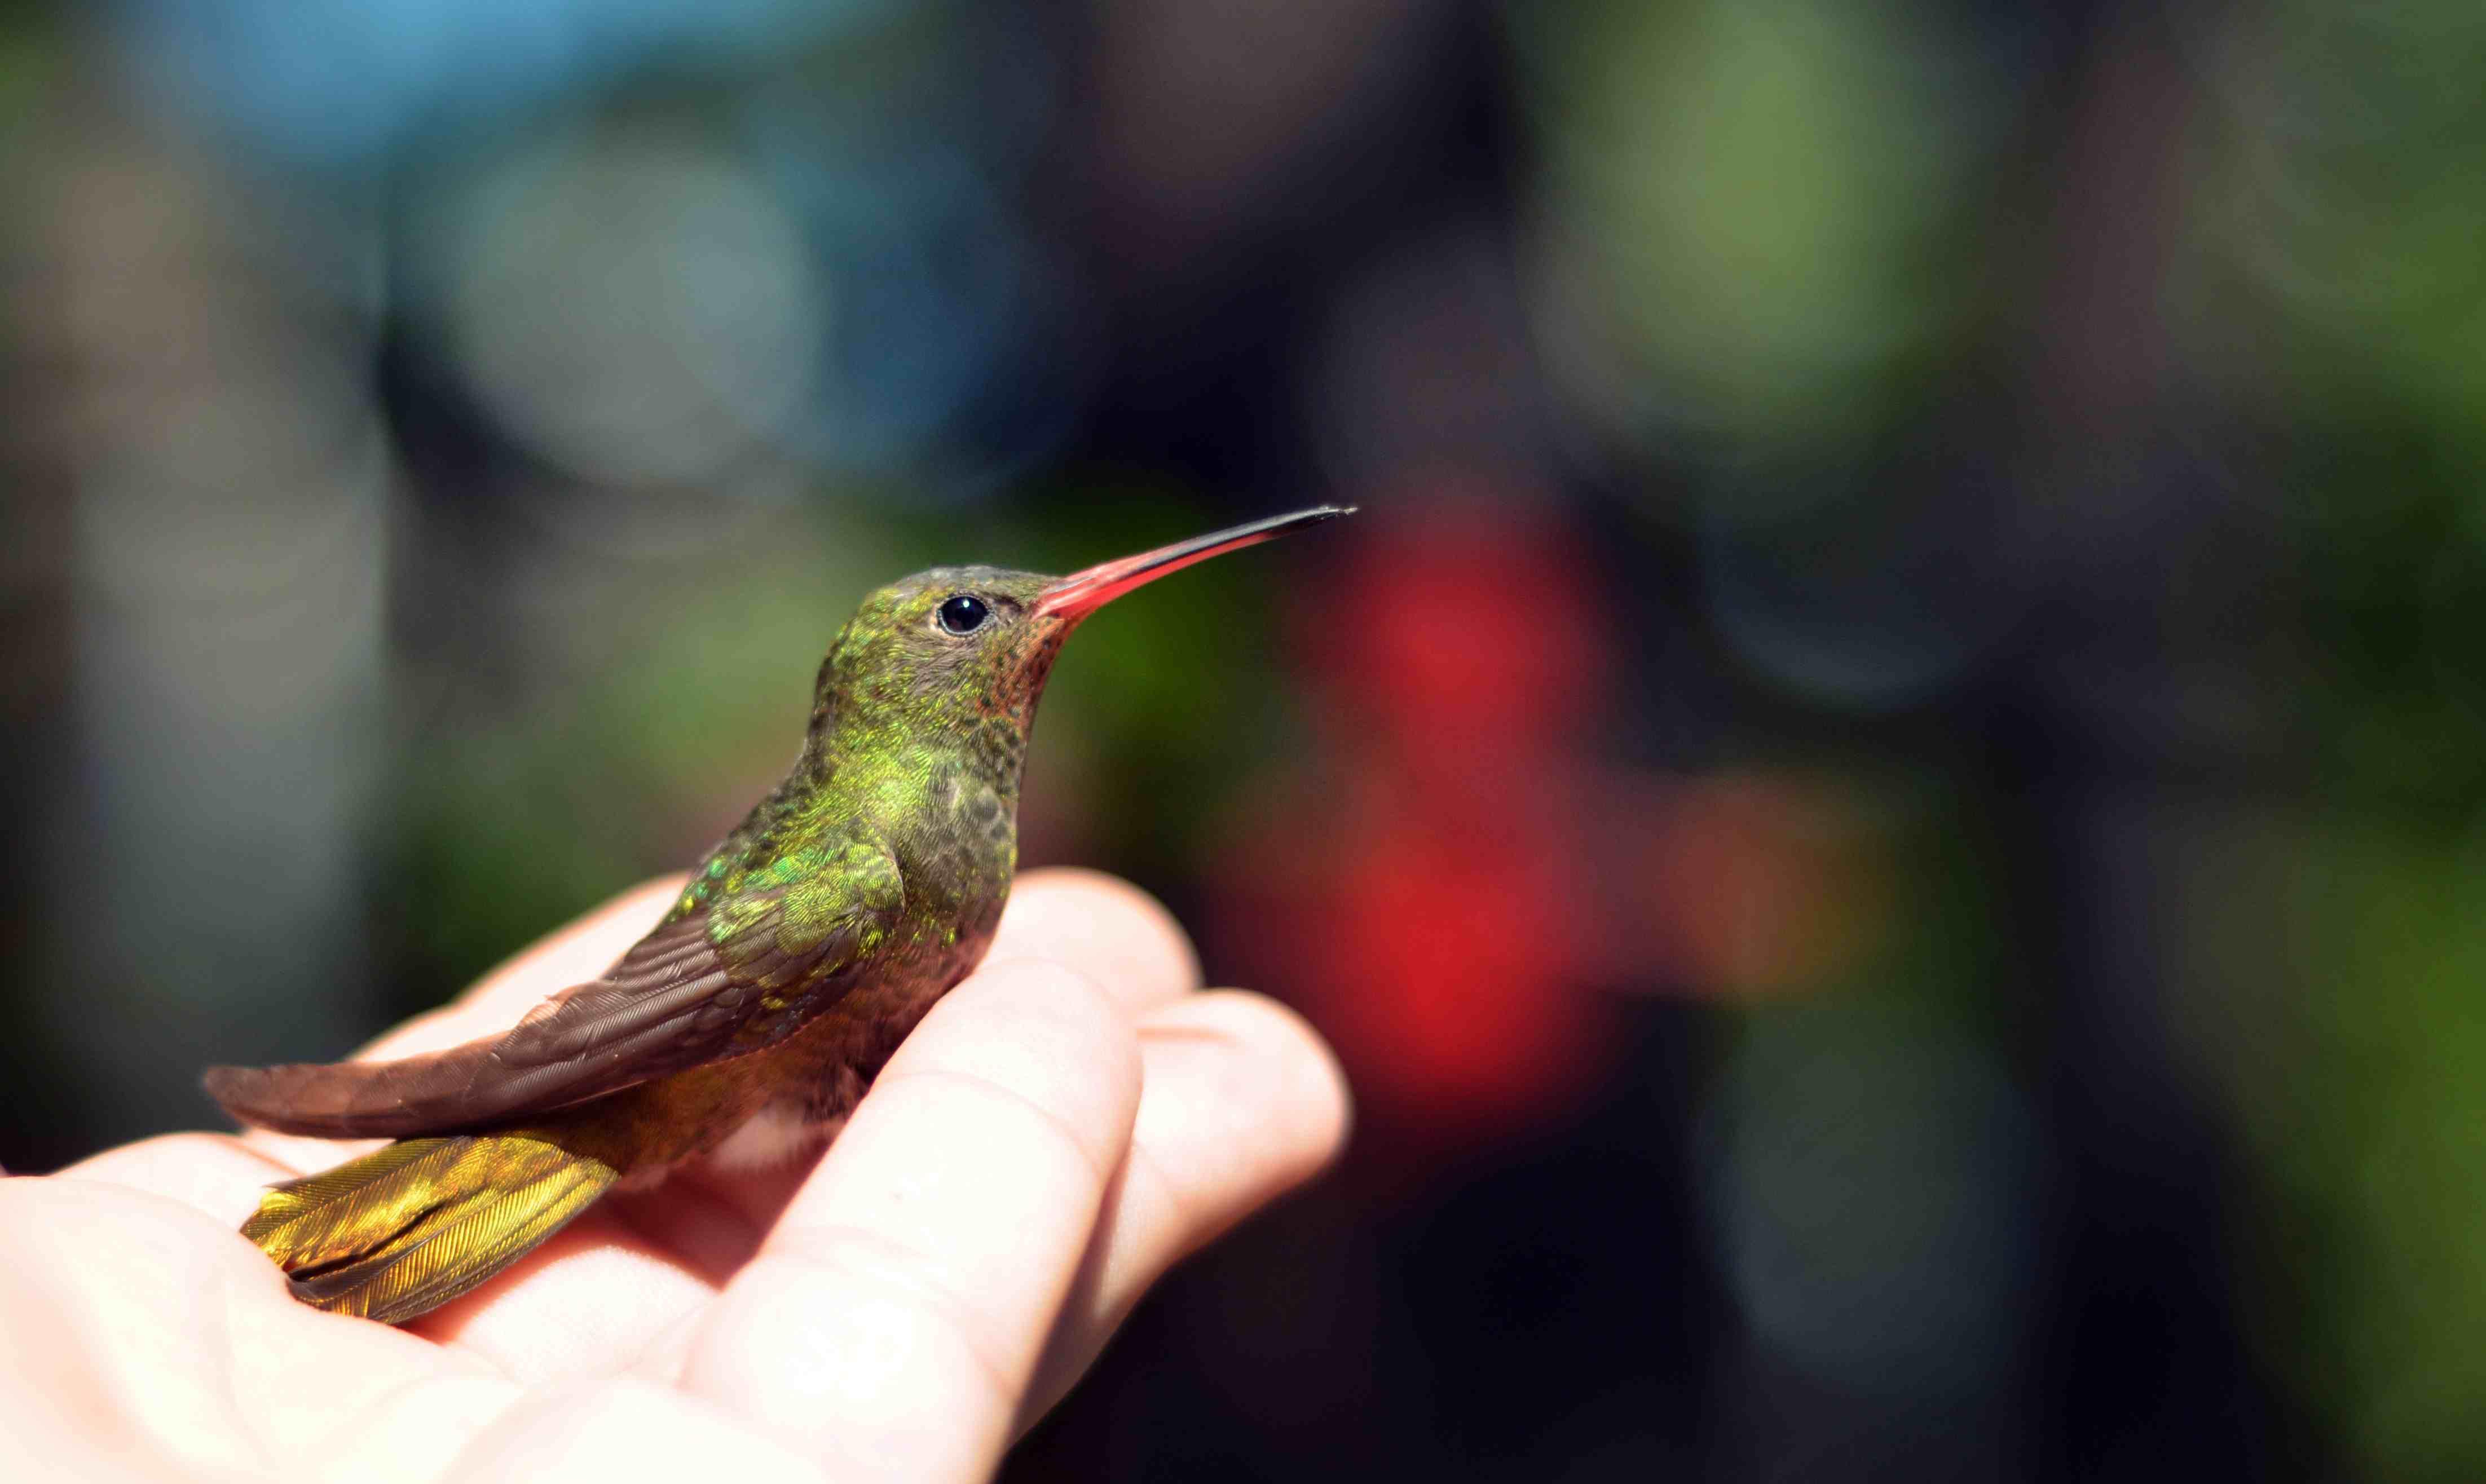 Hand holding a hummingbird